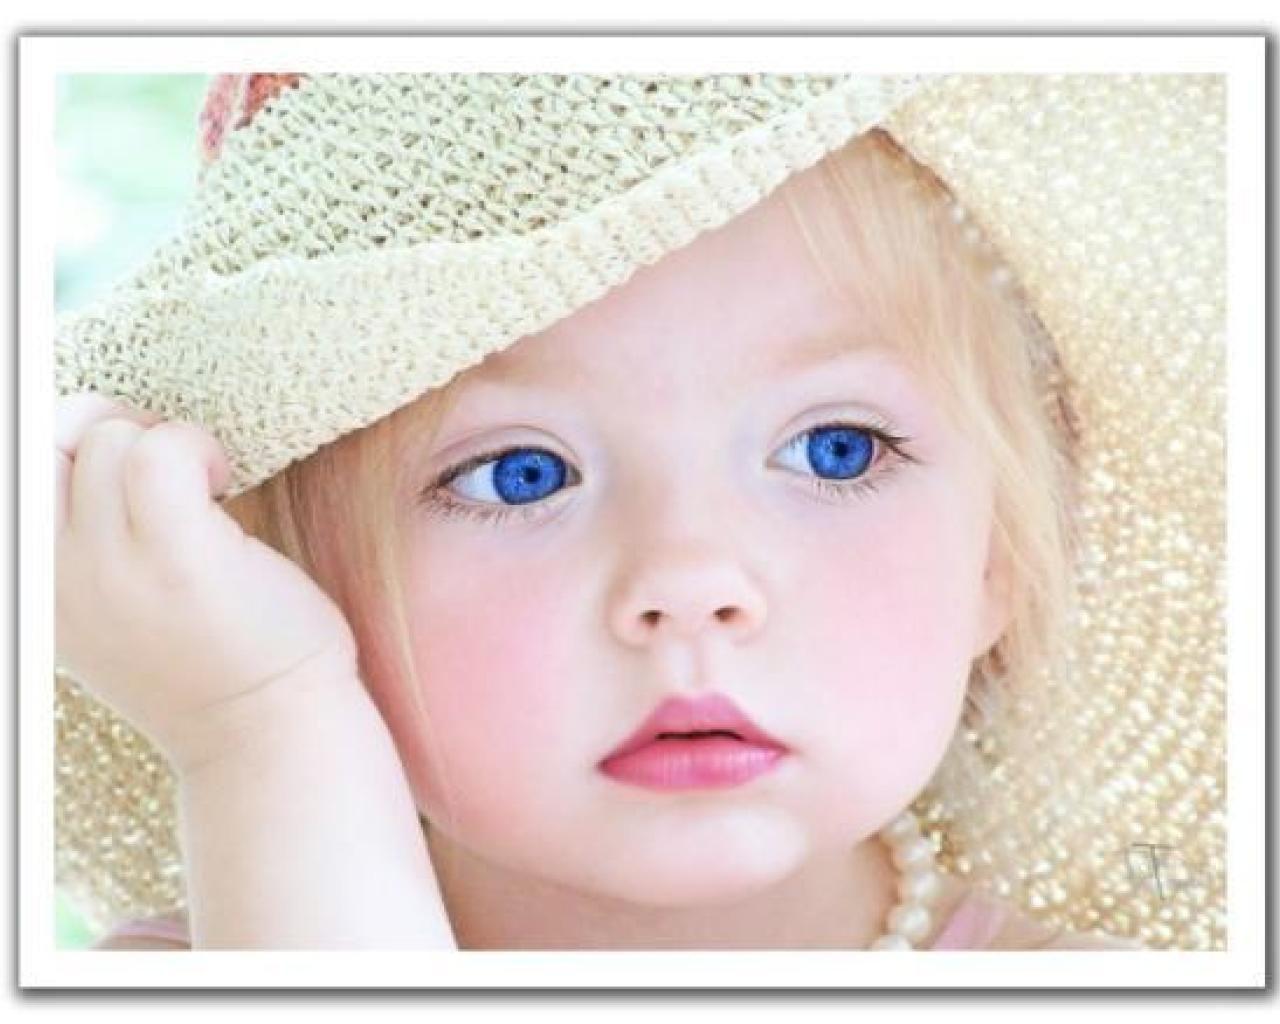 beautiful babies wallpapers - wallpaper cave | baby | pinterest